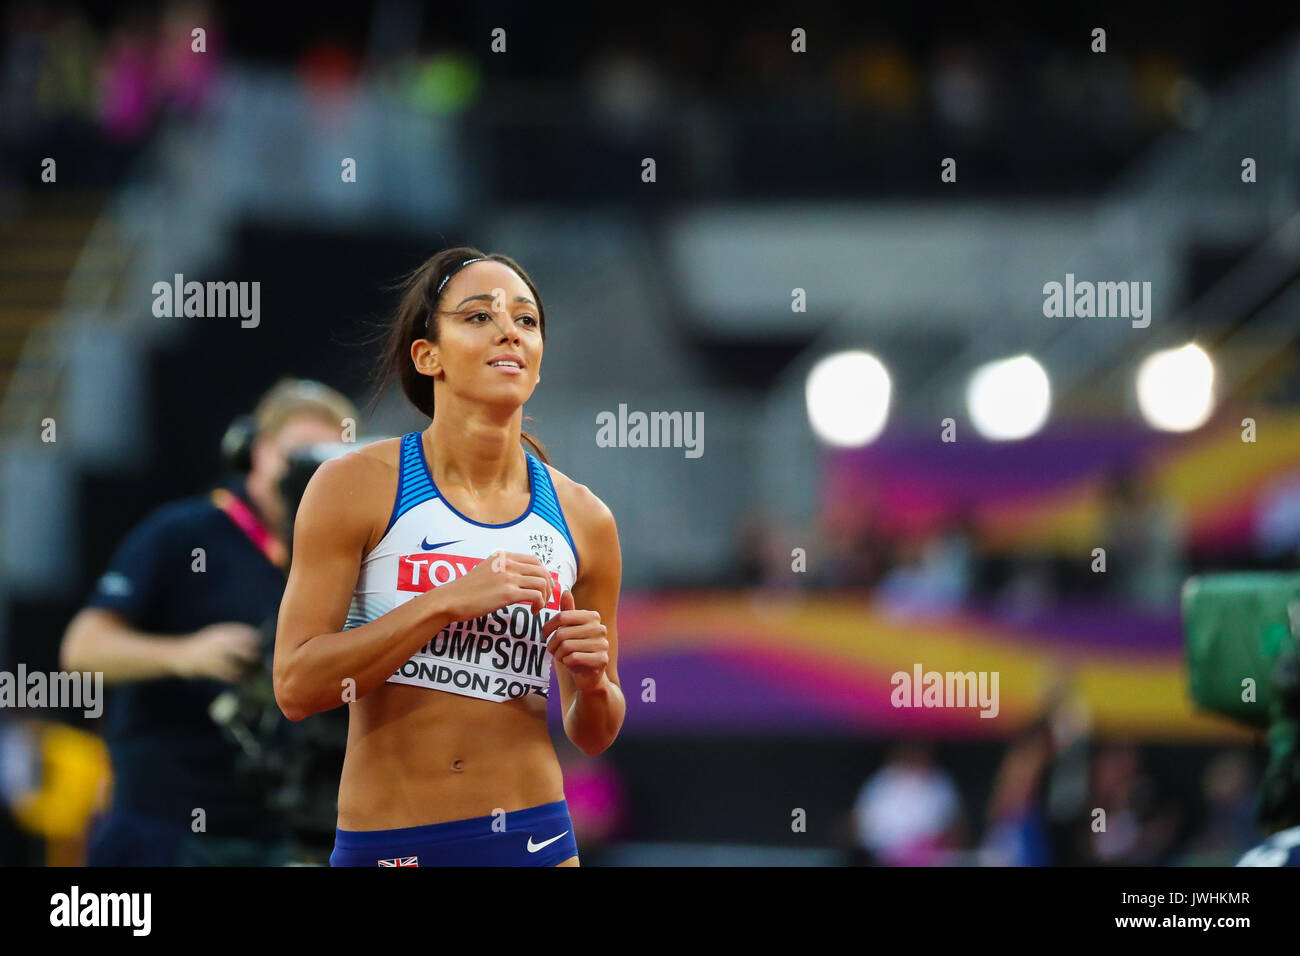 Katarina Johnson-Thompson, Great Britain, in the women's high jump final on day nine of the IAAF London 2017 world Championships at the London Stadium. © Paul Davey. - Stock Image